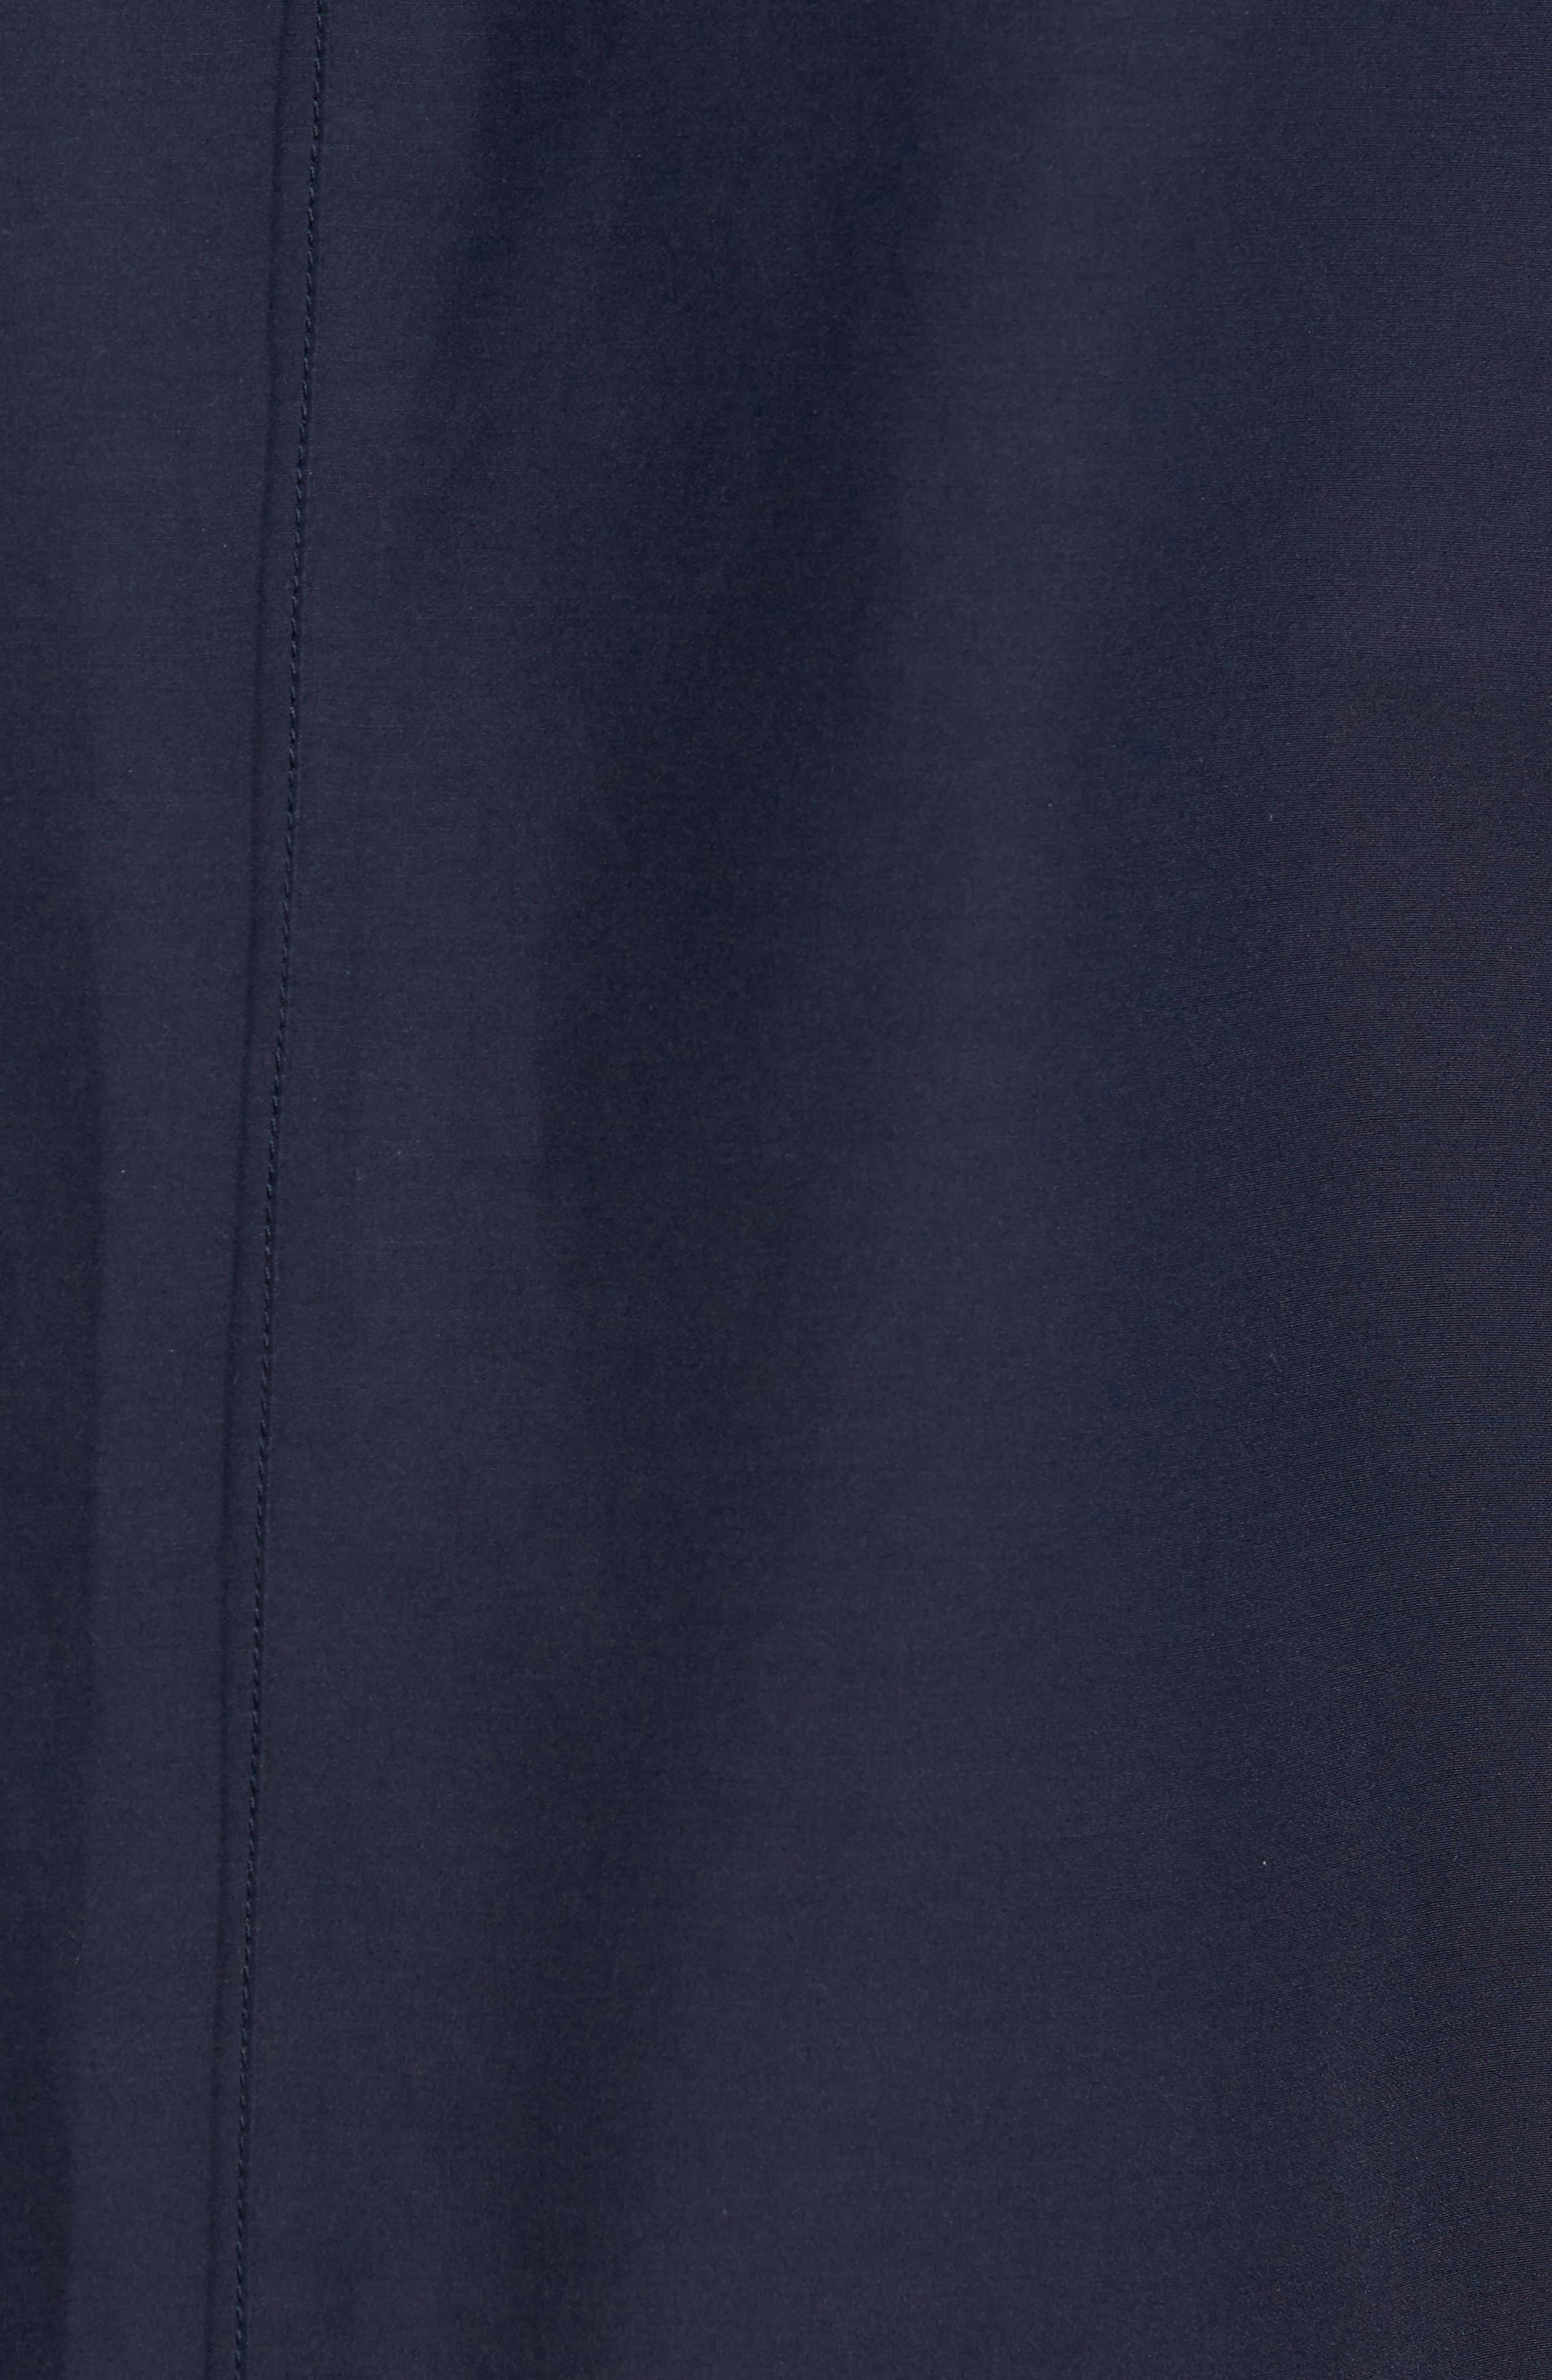 Bonded Cotton Blend Rain Jacket,                             Alternate thumbnail 6, color,                             NAVY